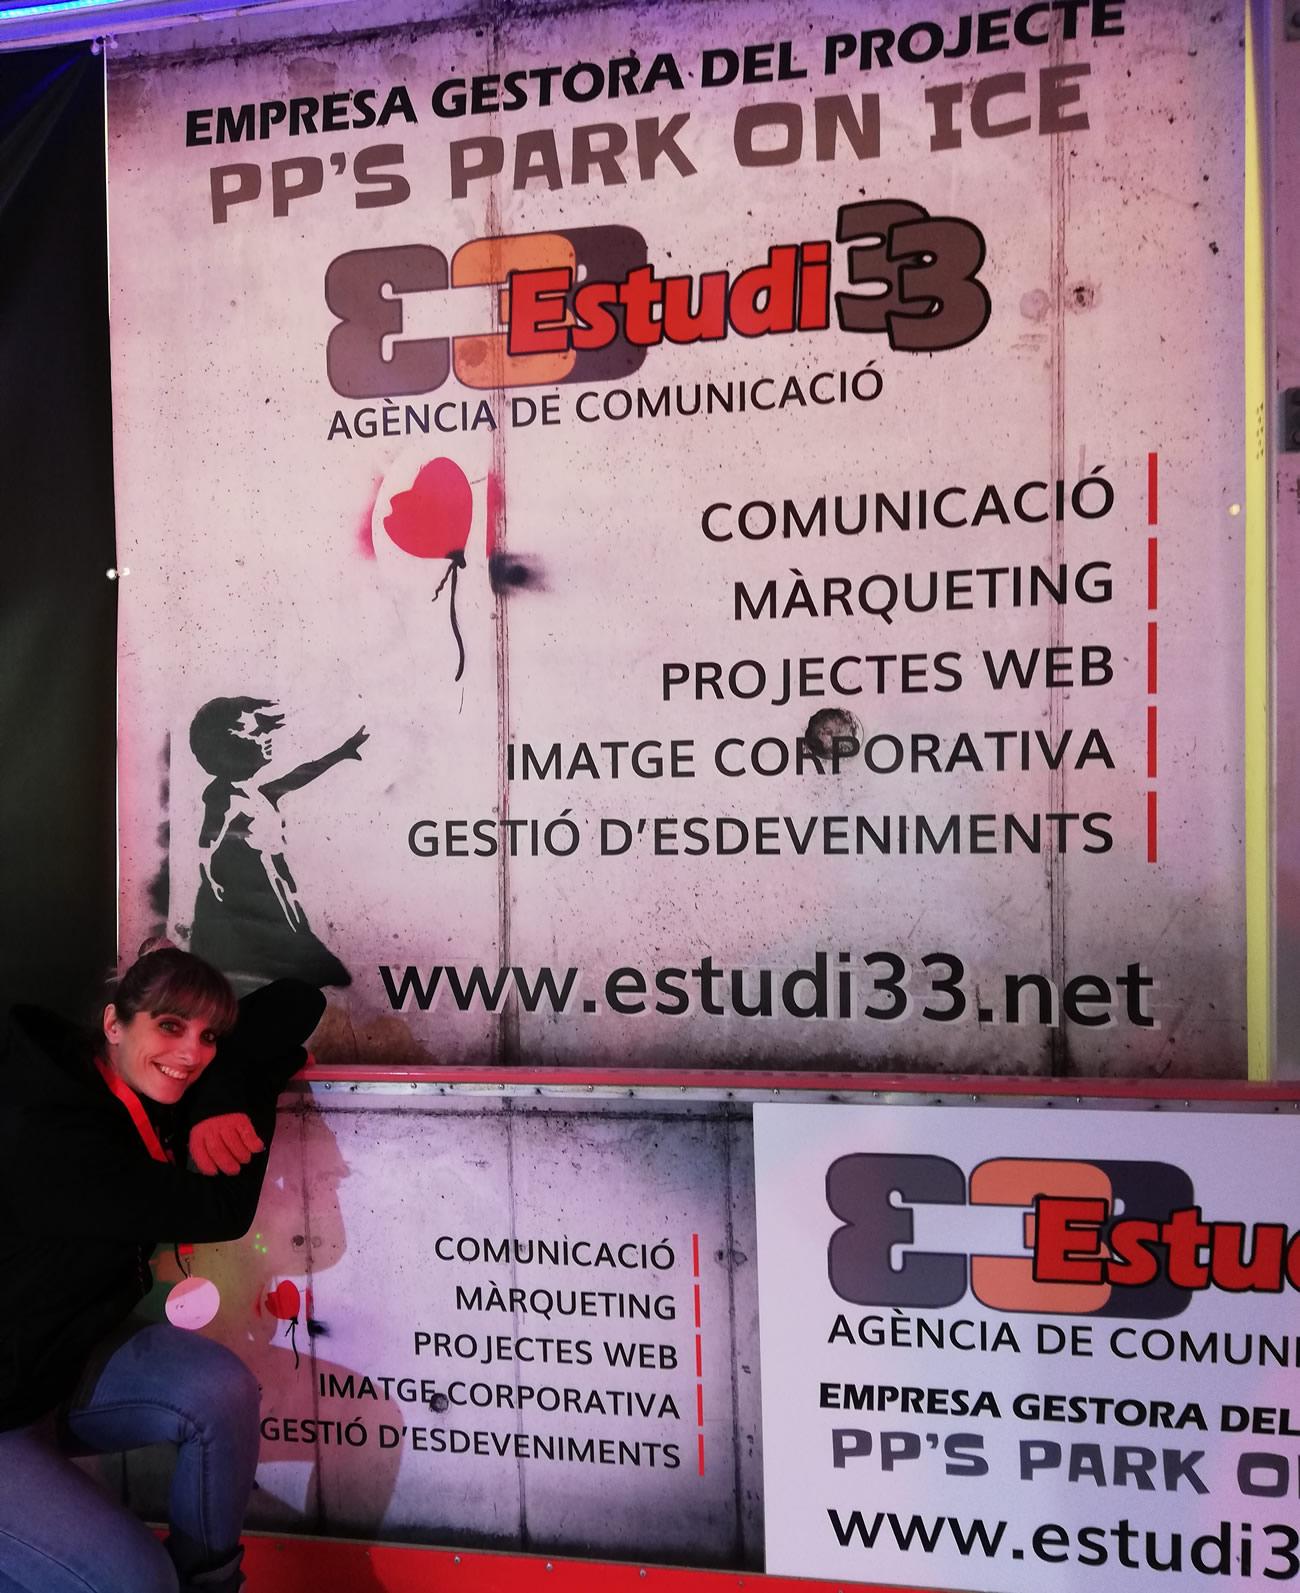 Pp's Park on ice | Estudi 33